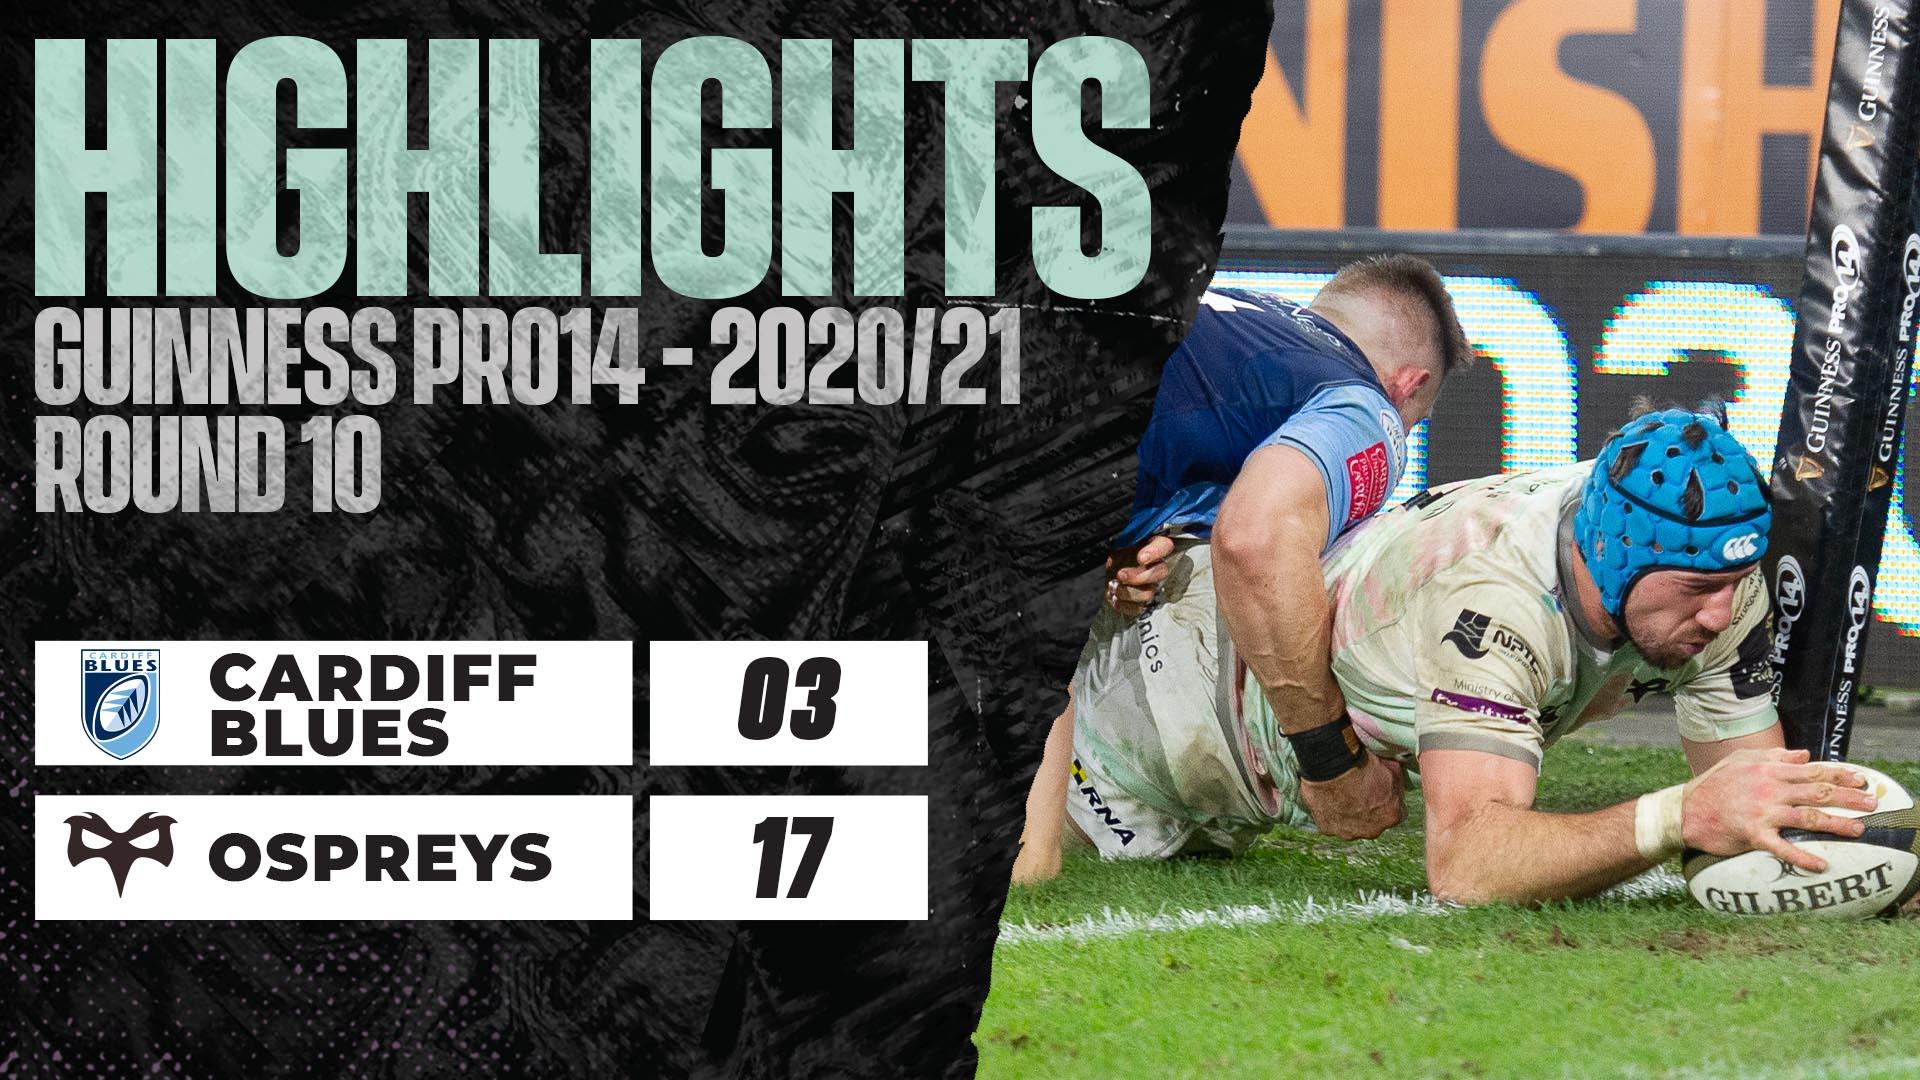 HIGHLIGHTS Cardiff v Ospreys